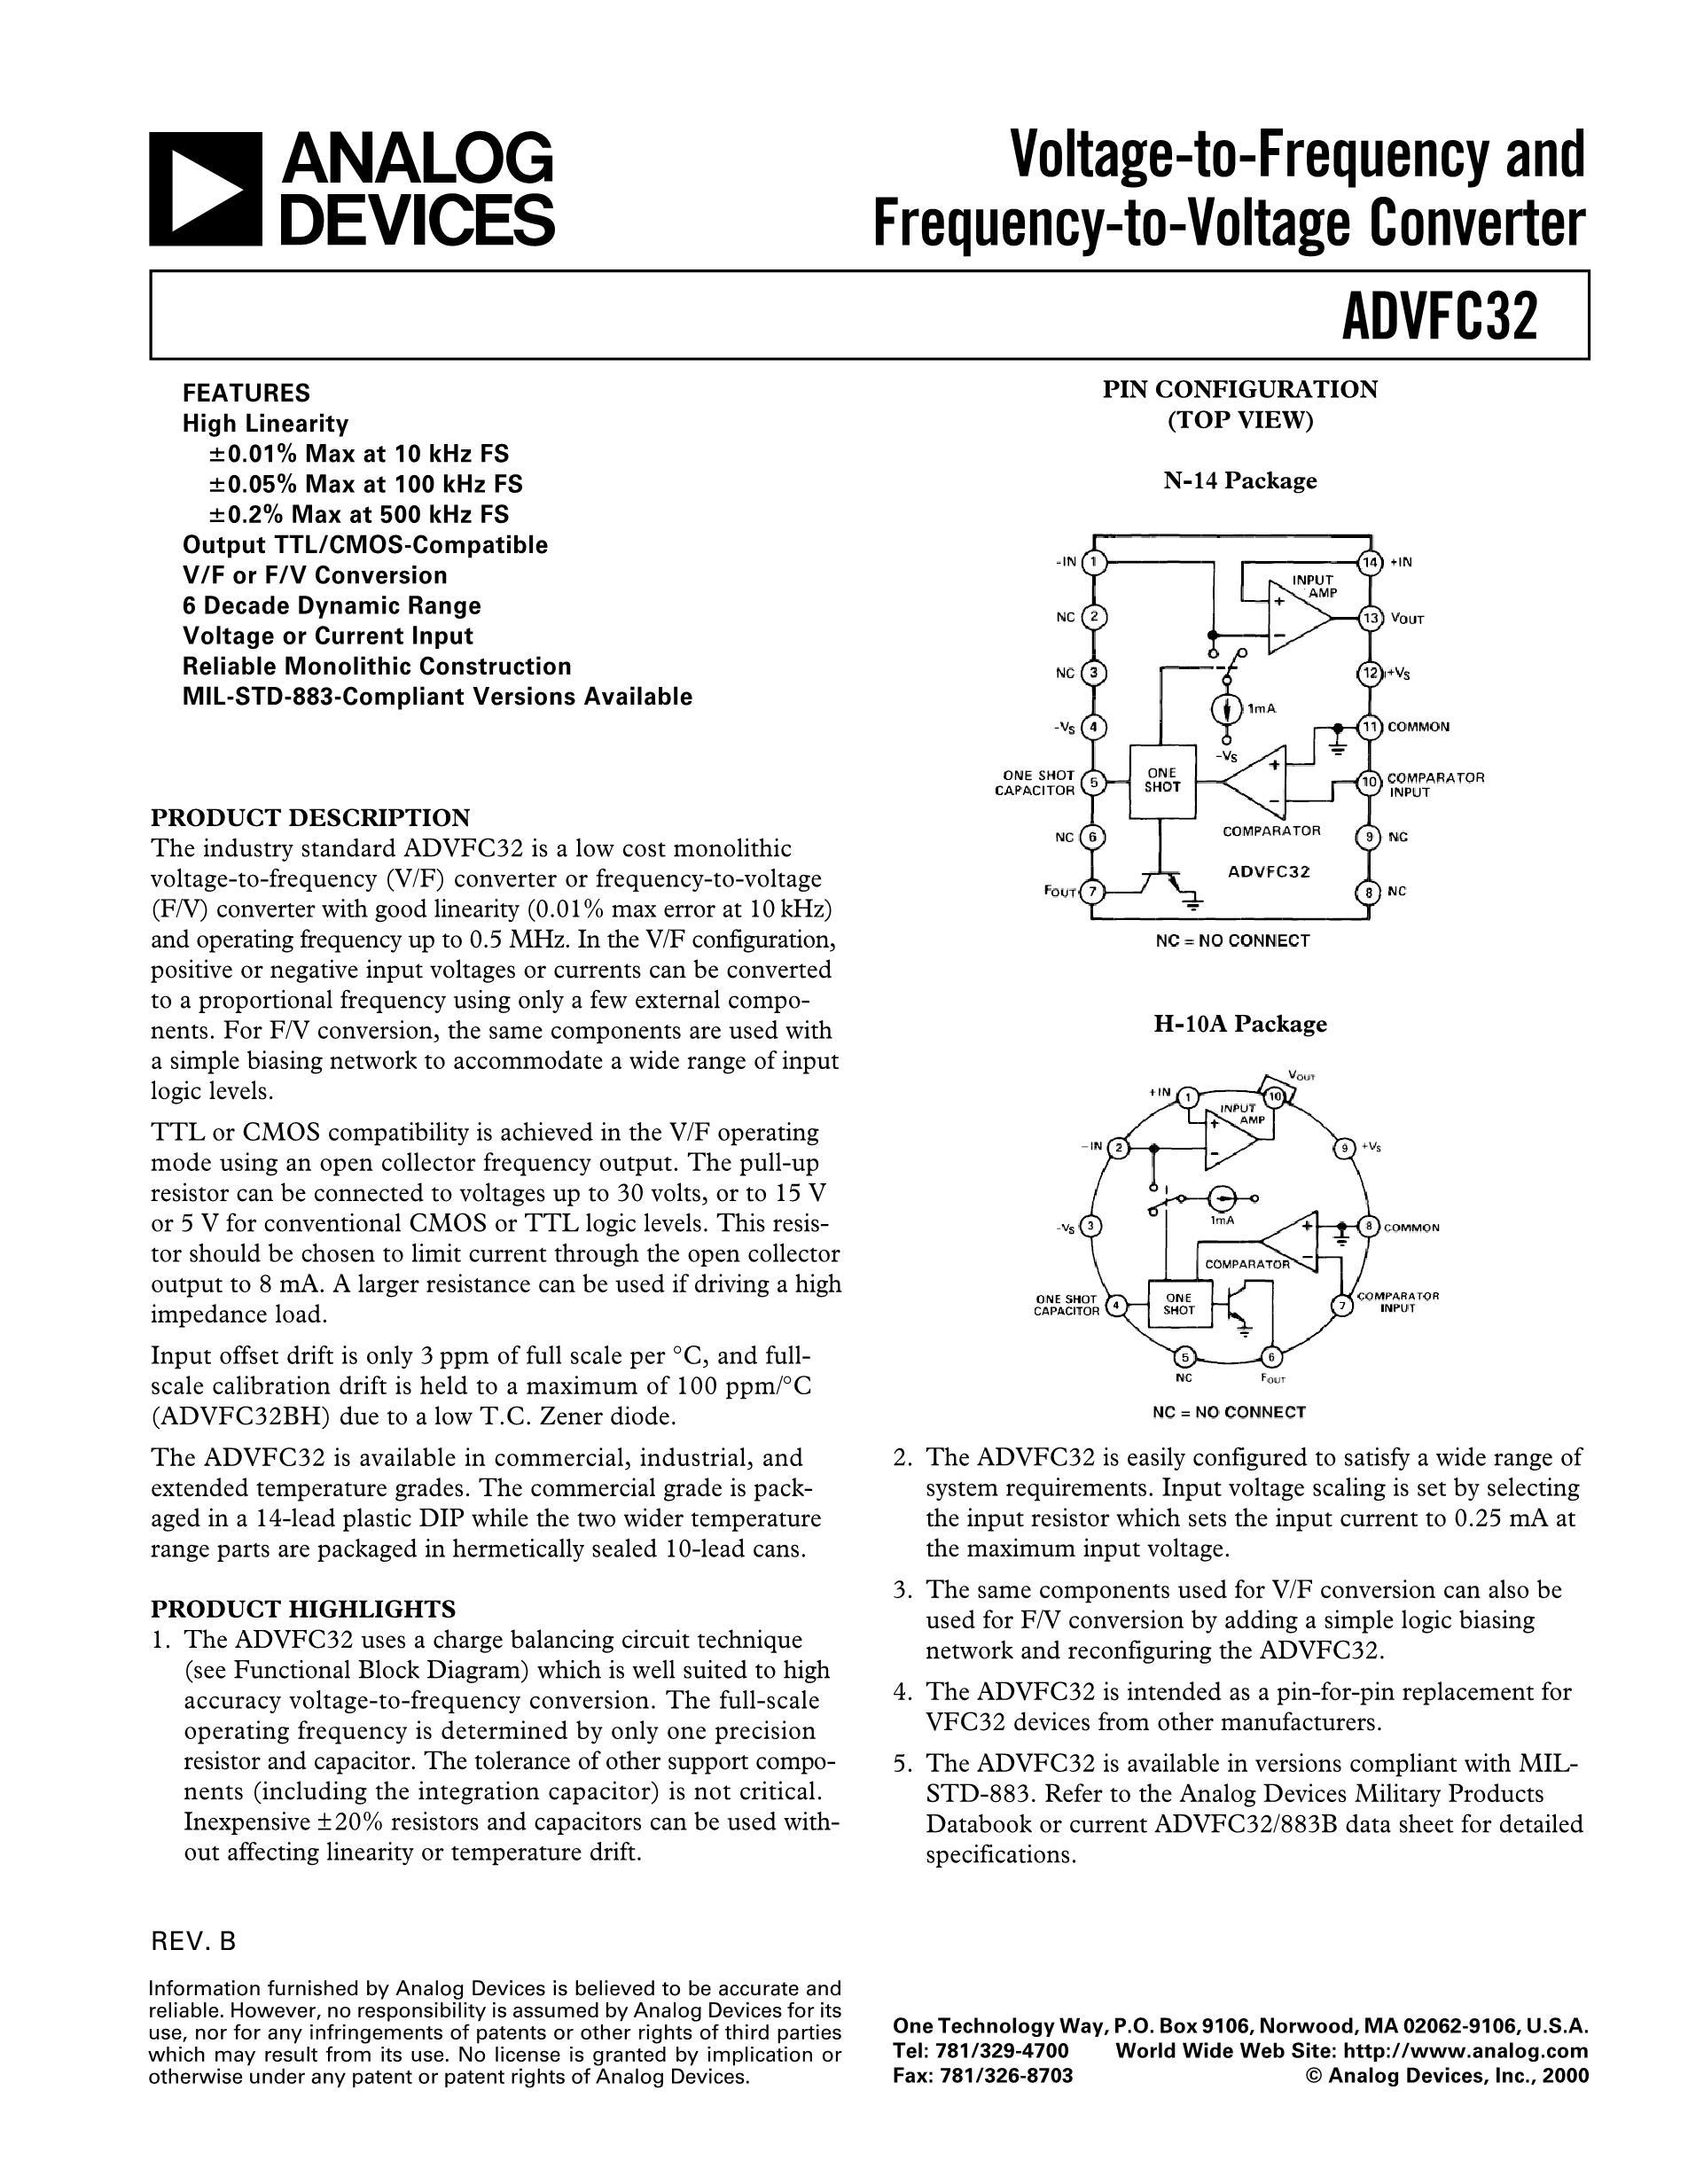 ADVFC32KNZ's pdf picture 1